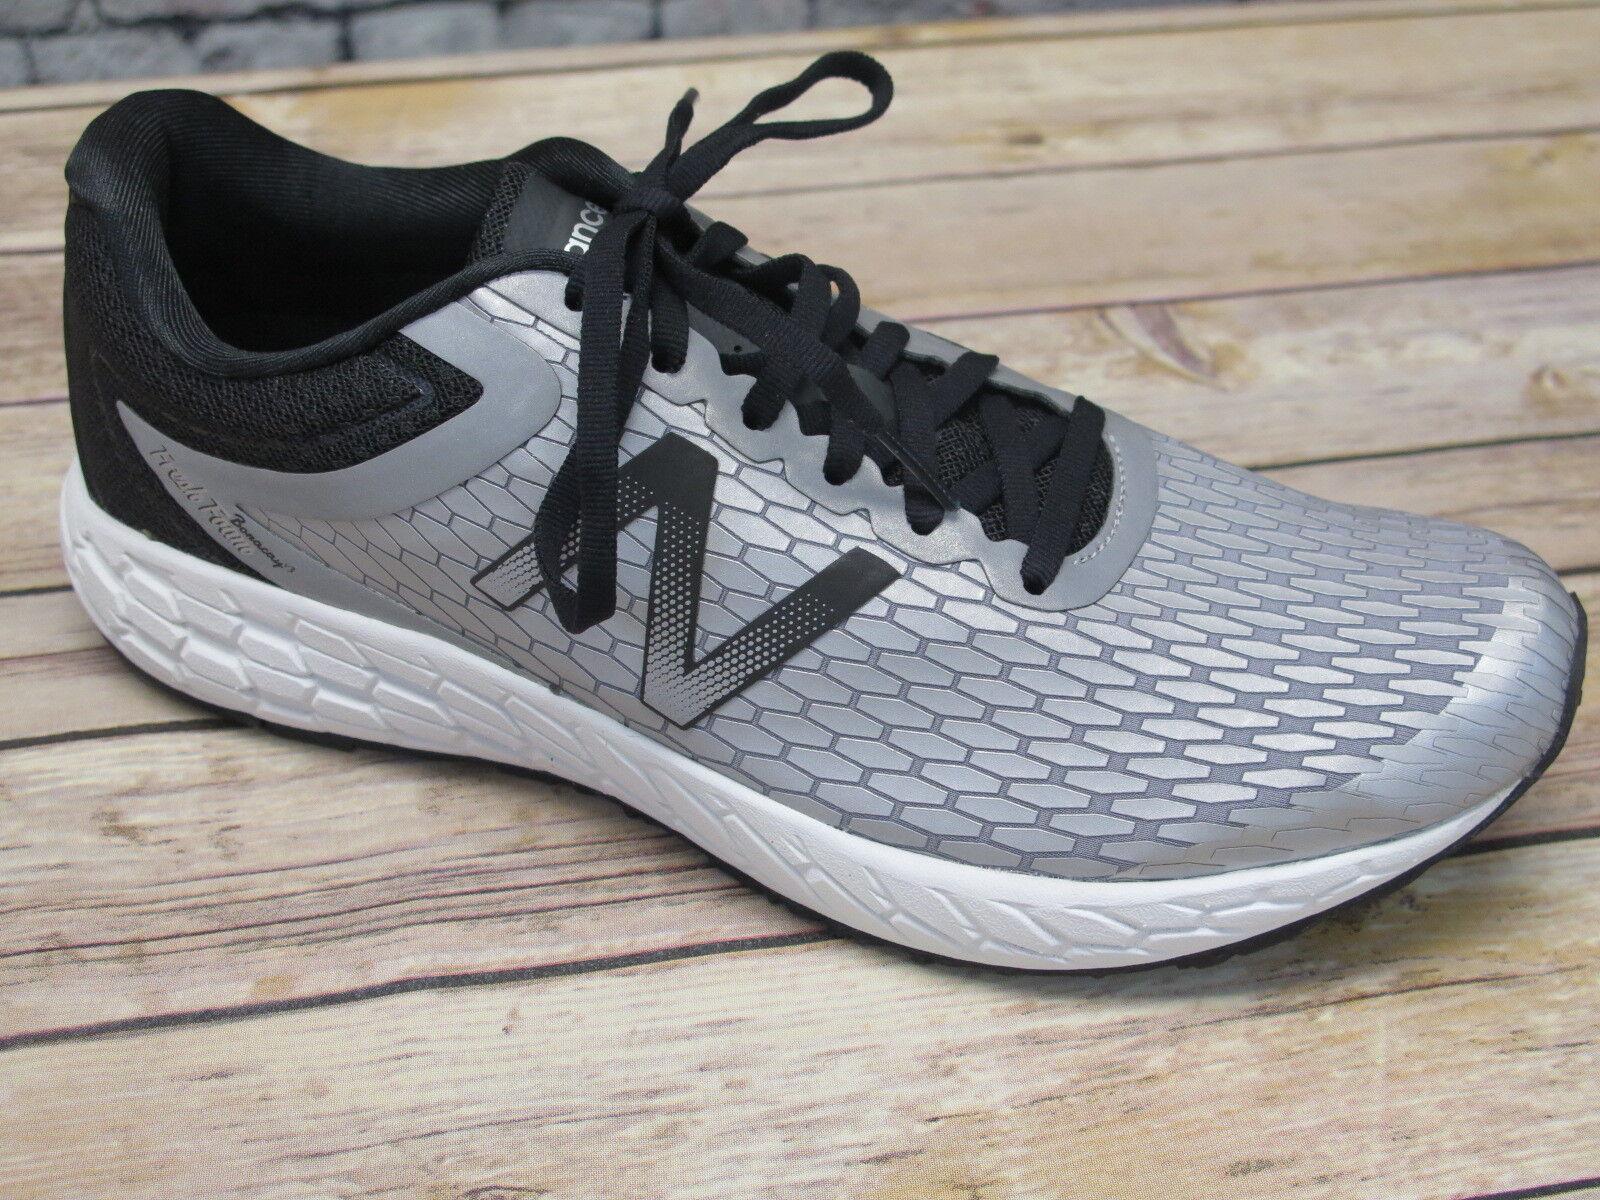 New Hombre Plata MBORASR 3 Balance Malla Running zapatos